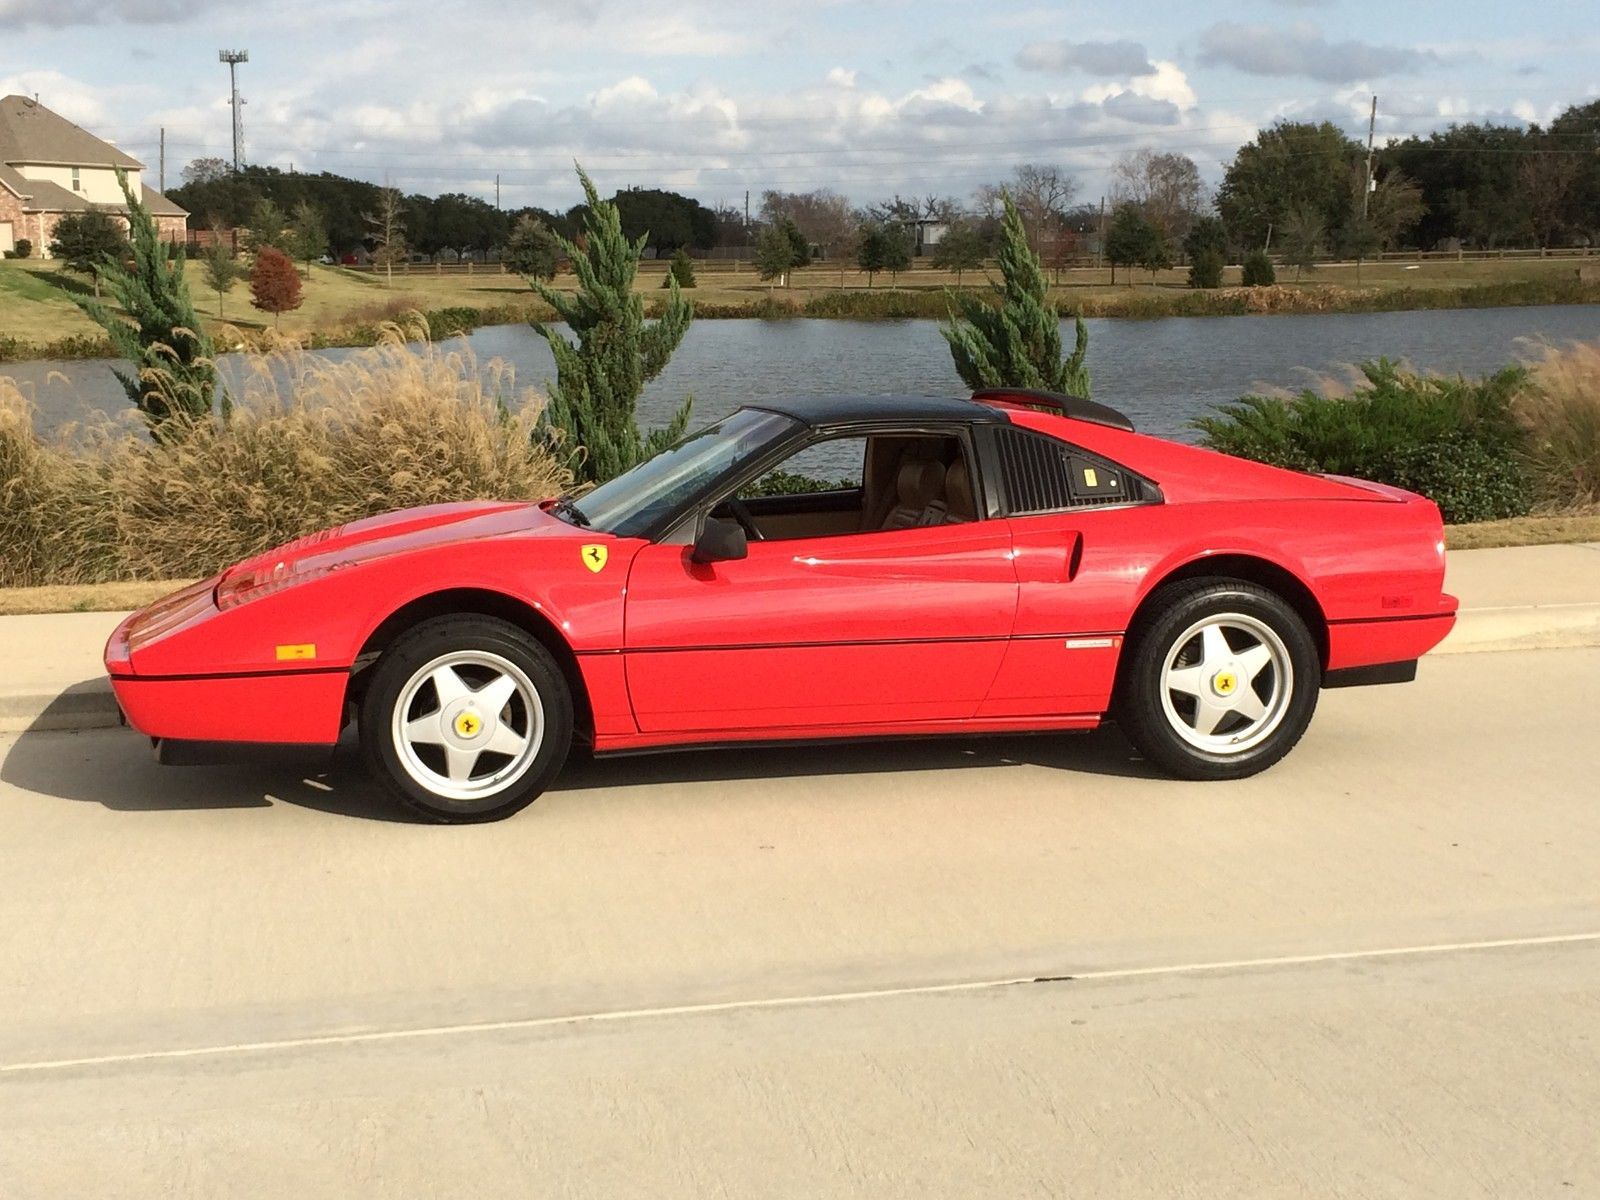 1986 Ferrari 328 Gts Replica On Pontiac Fiero Se Chasis 2 8v6